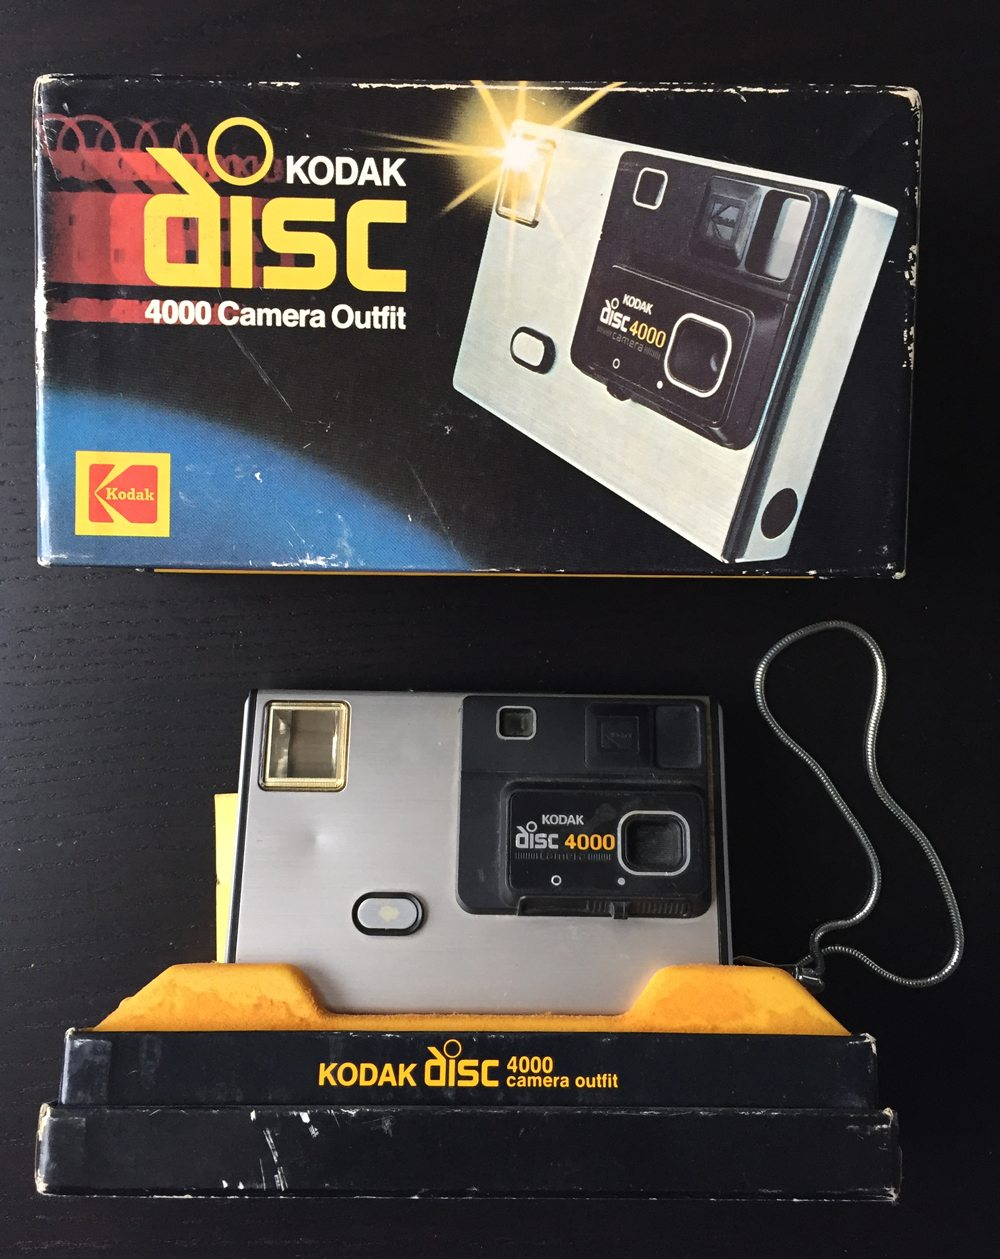 Vintage camera Kodak disk 4000 in original box